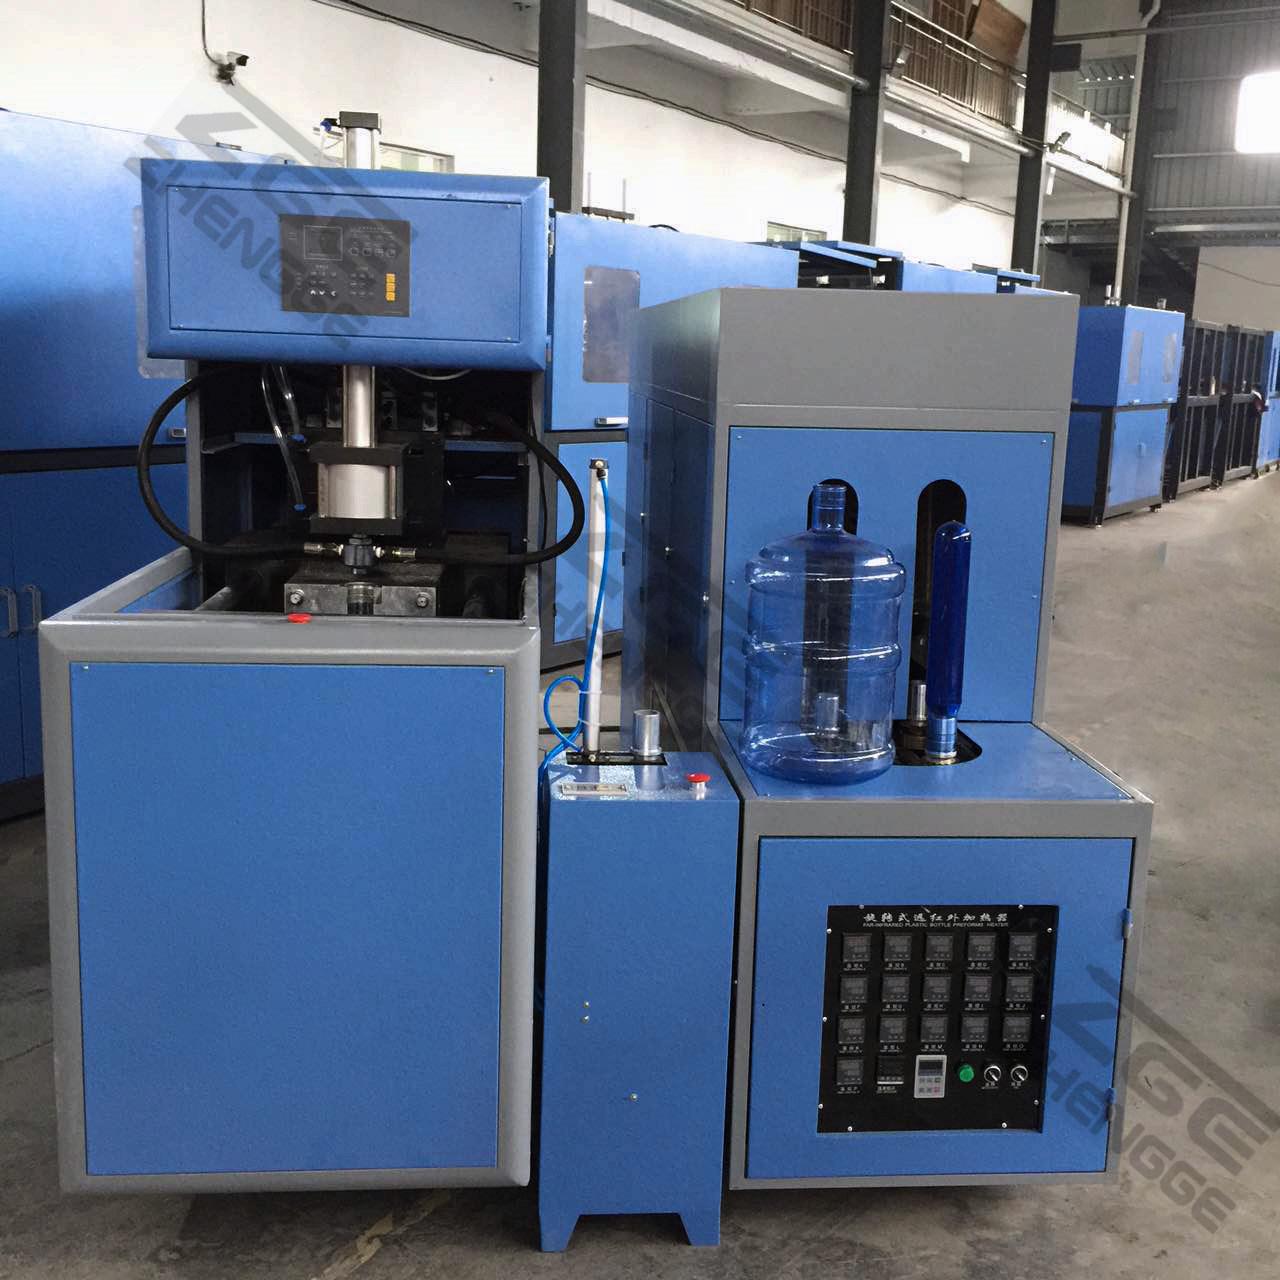 5 Gallon/18.9L Pet Bottle Blow Molding Machinery Semi-Automatic Type